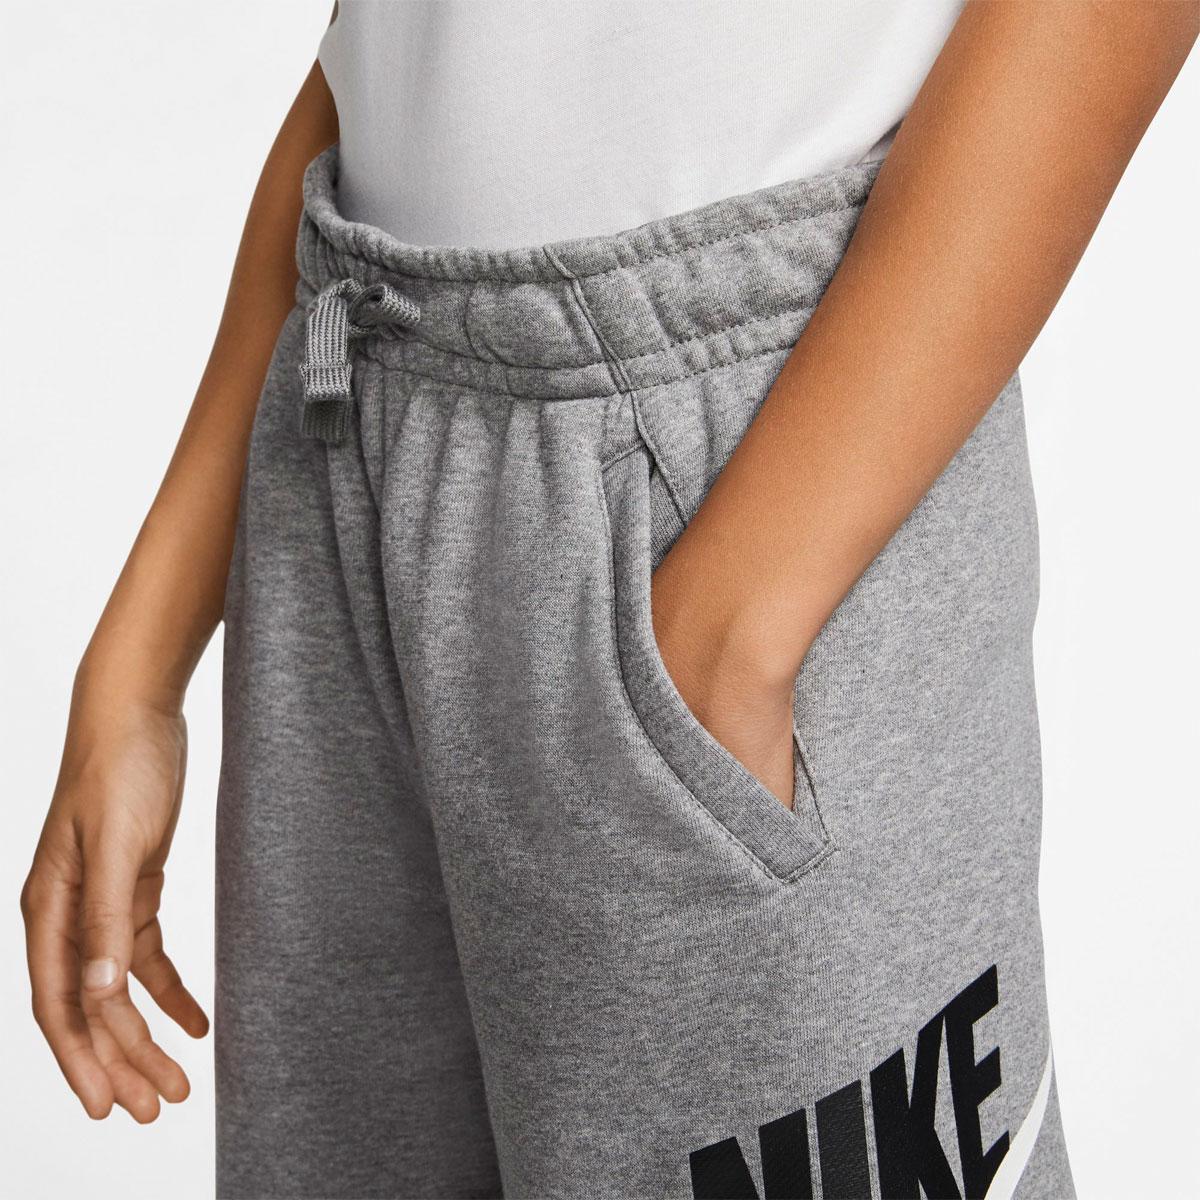 Boys' Sportswear Club Fleece Shorts, Heather Gray, swatch